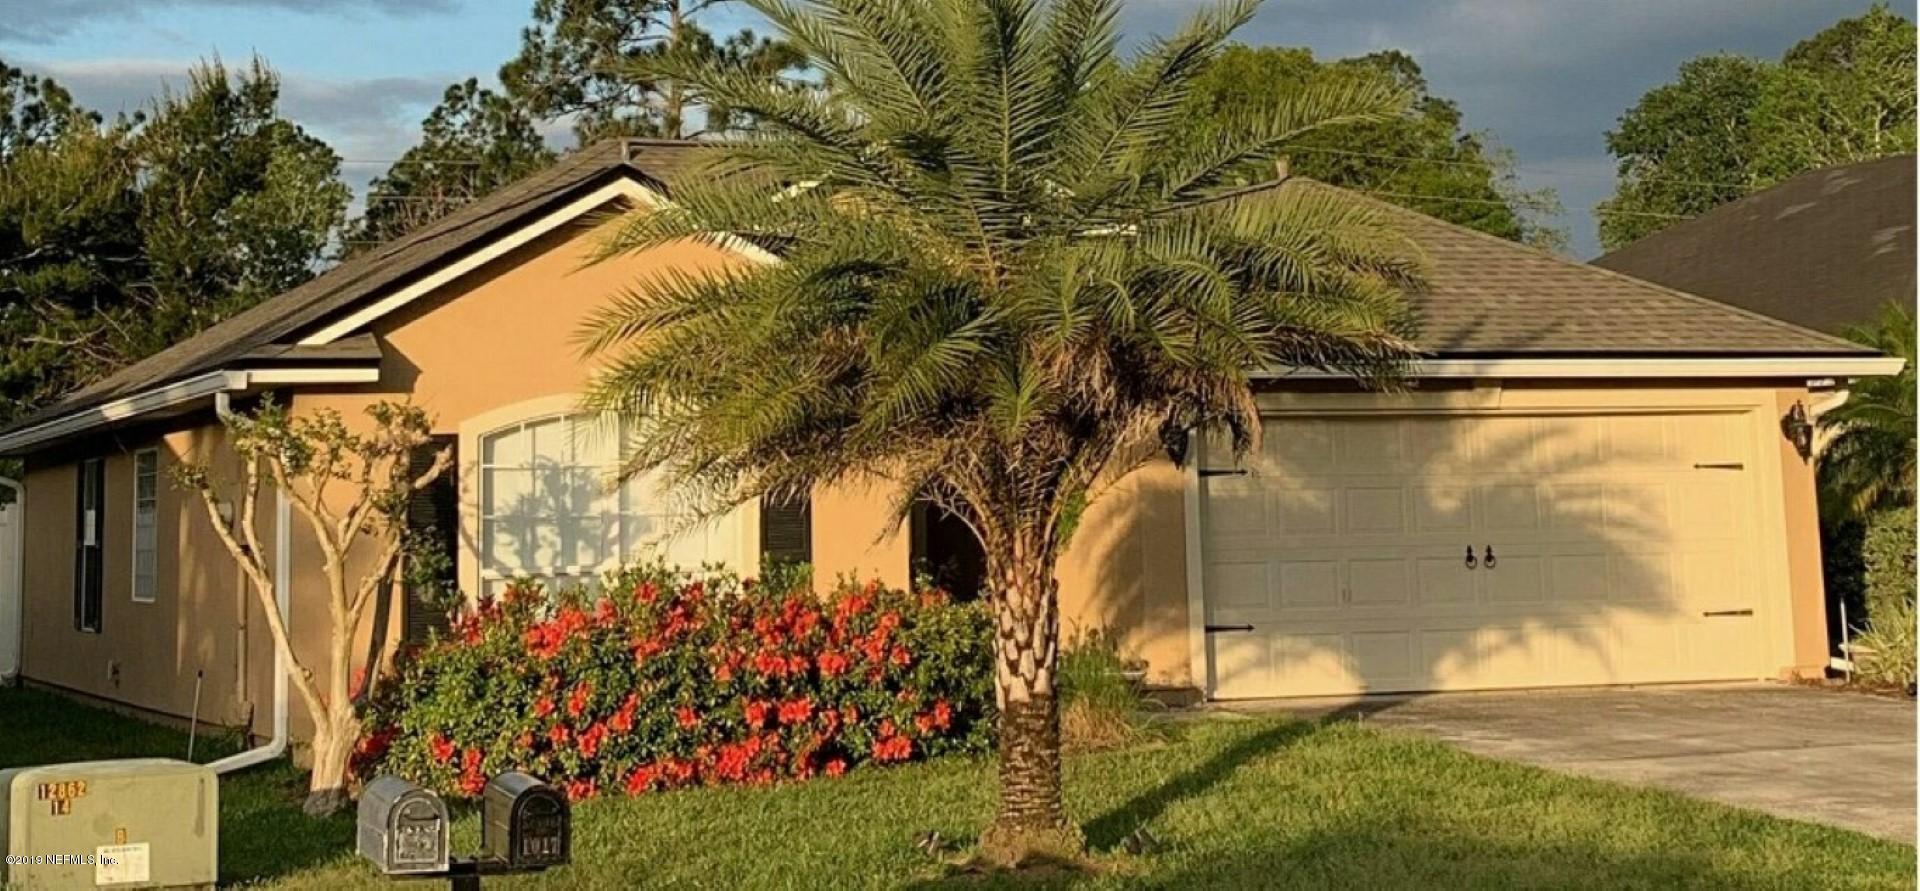 1012 OAK ARBOR, ST AUGUSTINE, FLORIDA 32084, 3 Bedrooms Bedrooms, ,2 BathroomsBathrooms,Residential - single family,For sale,OAK ARBOR,991009